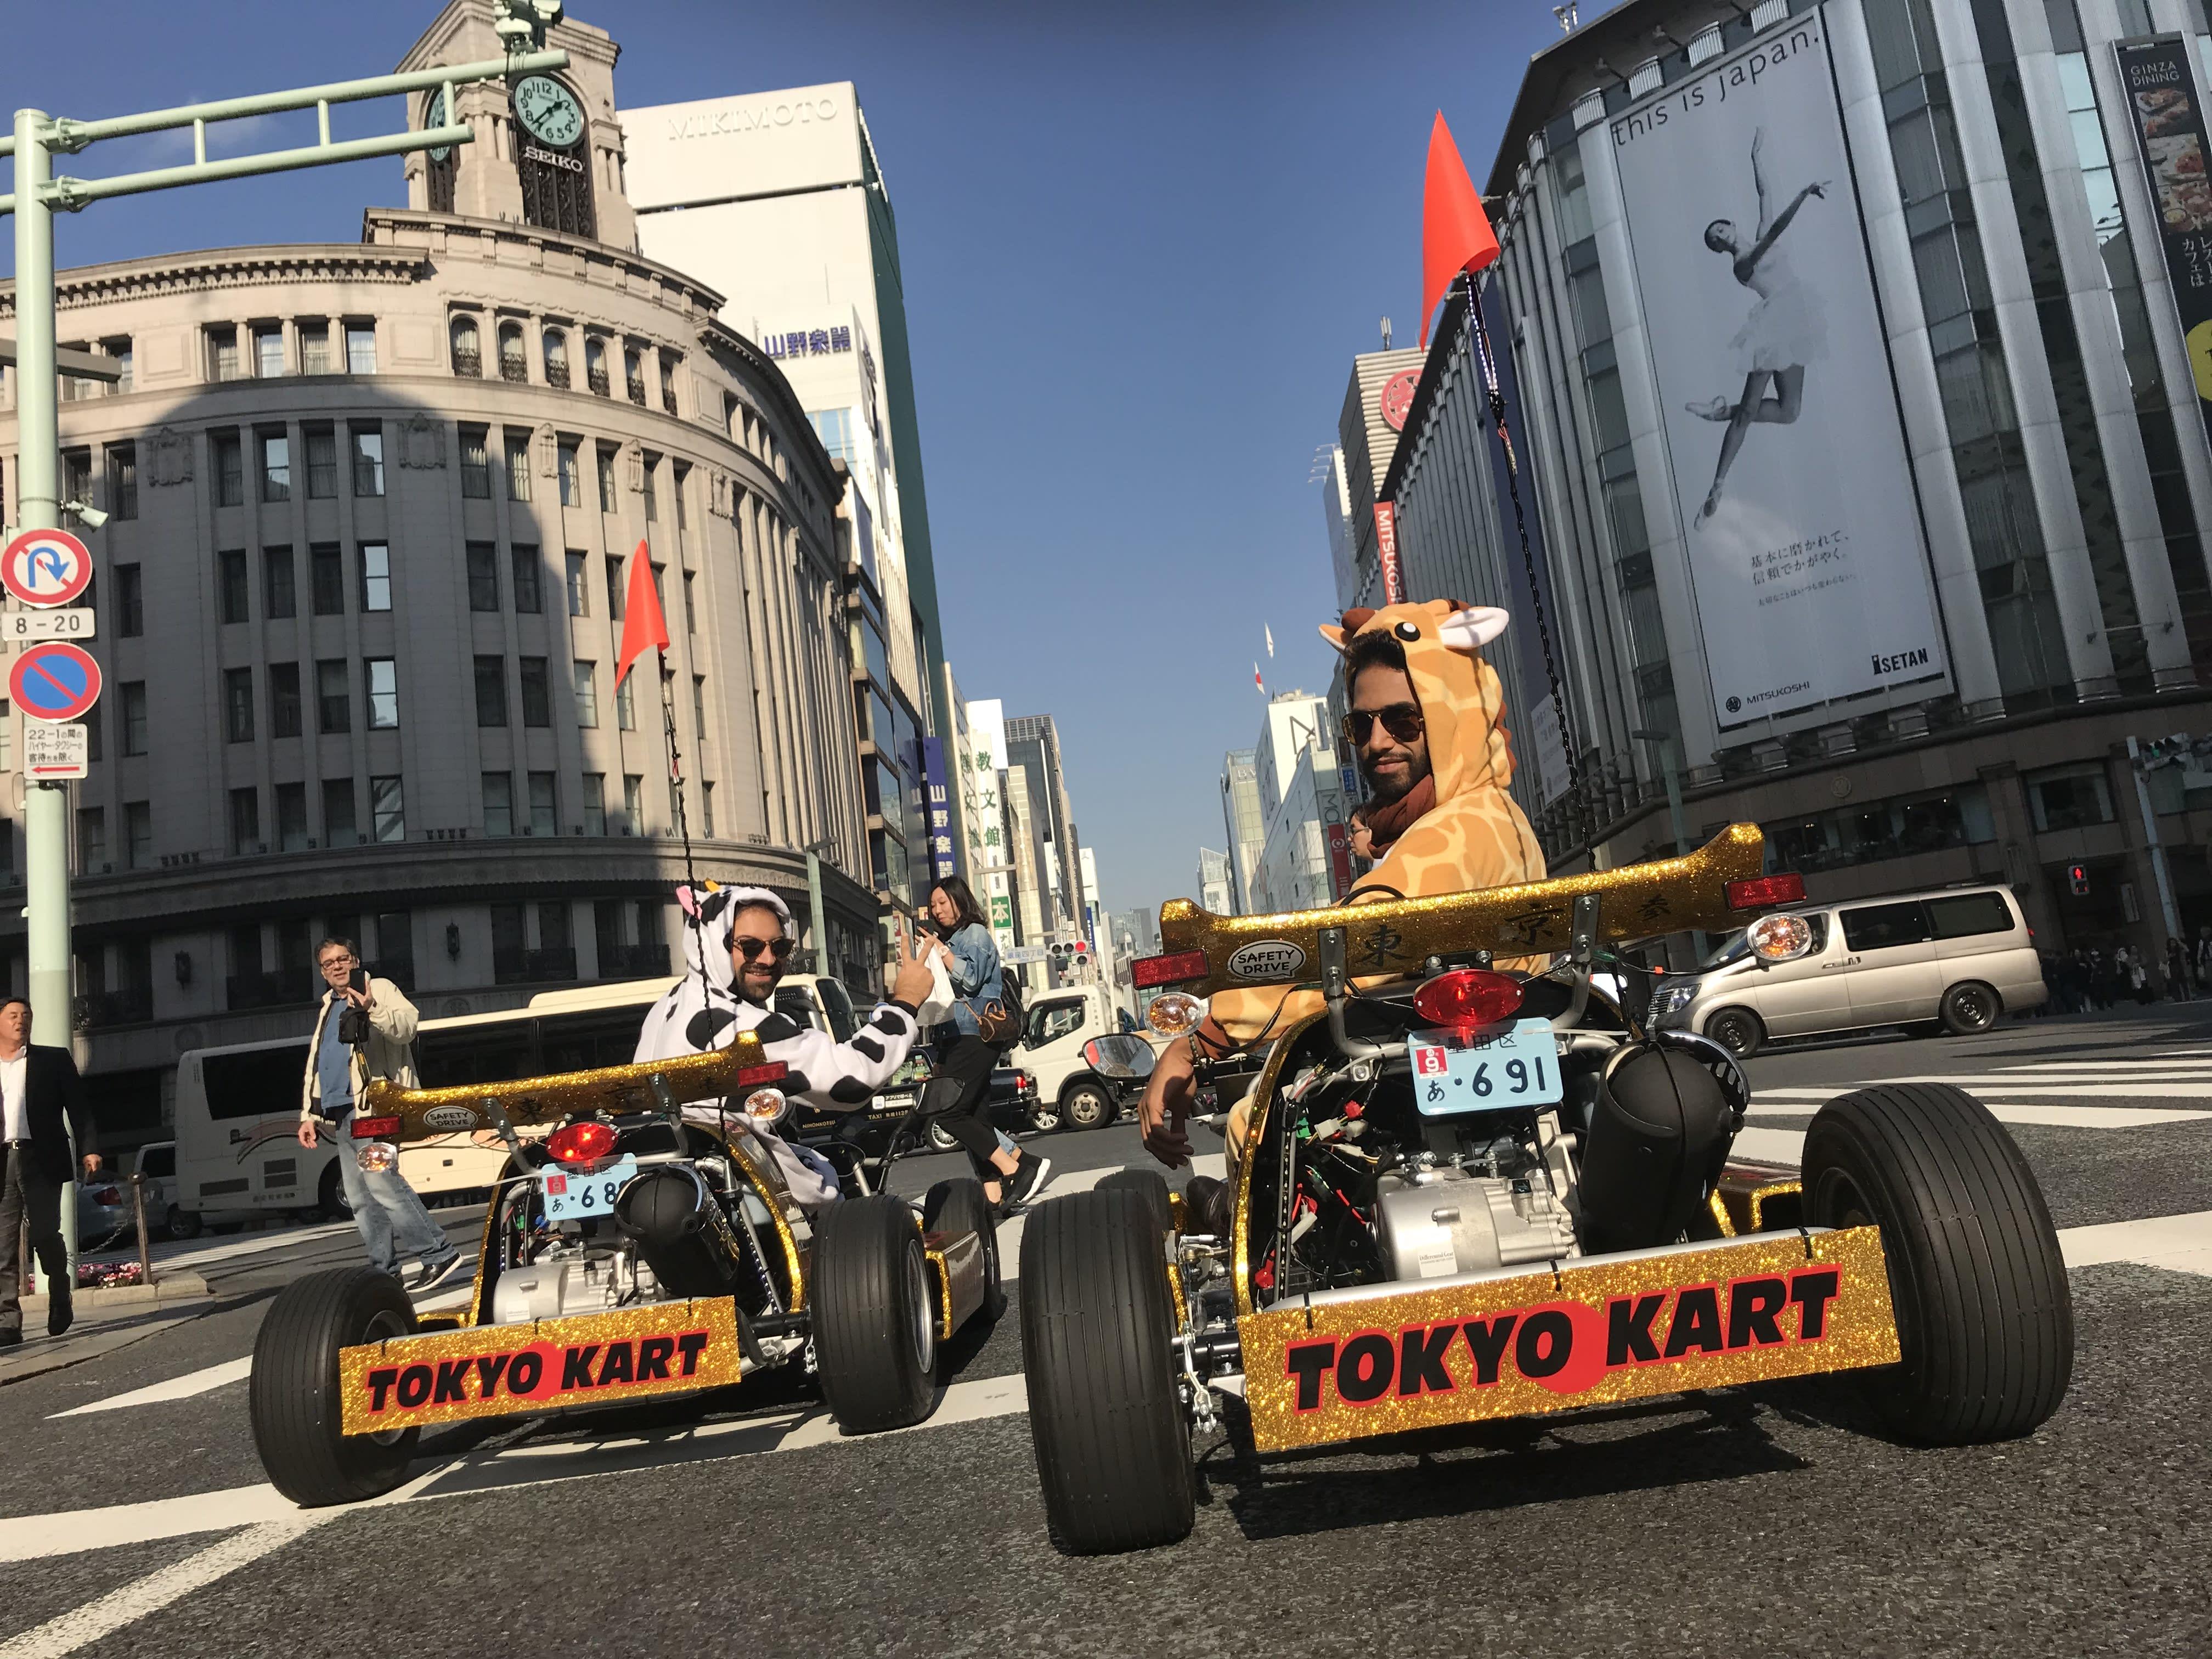 tokyo-subway-guide-street-go-karting